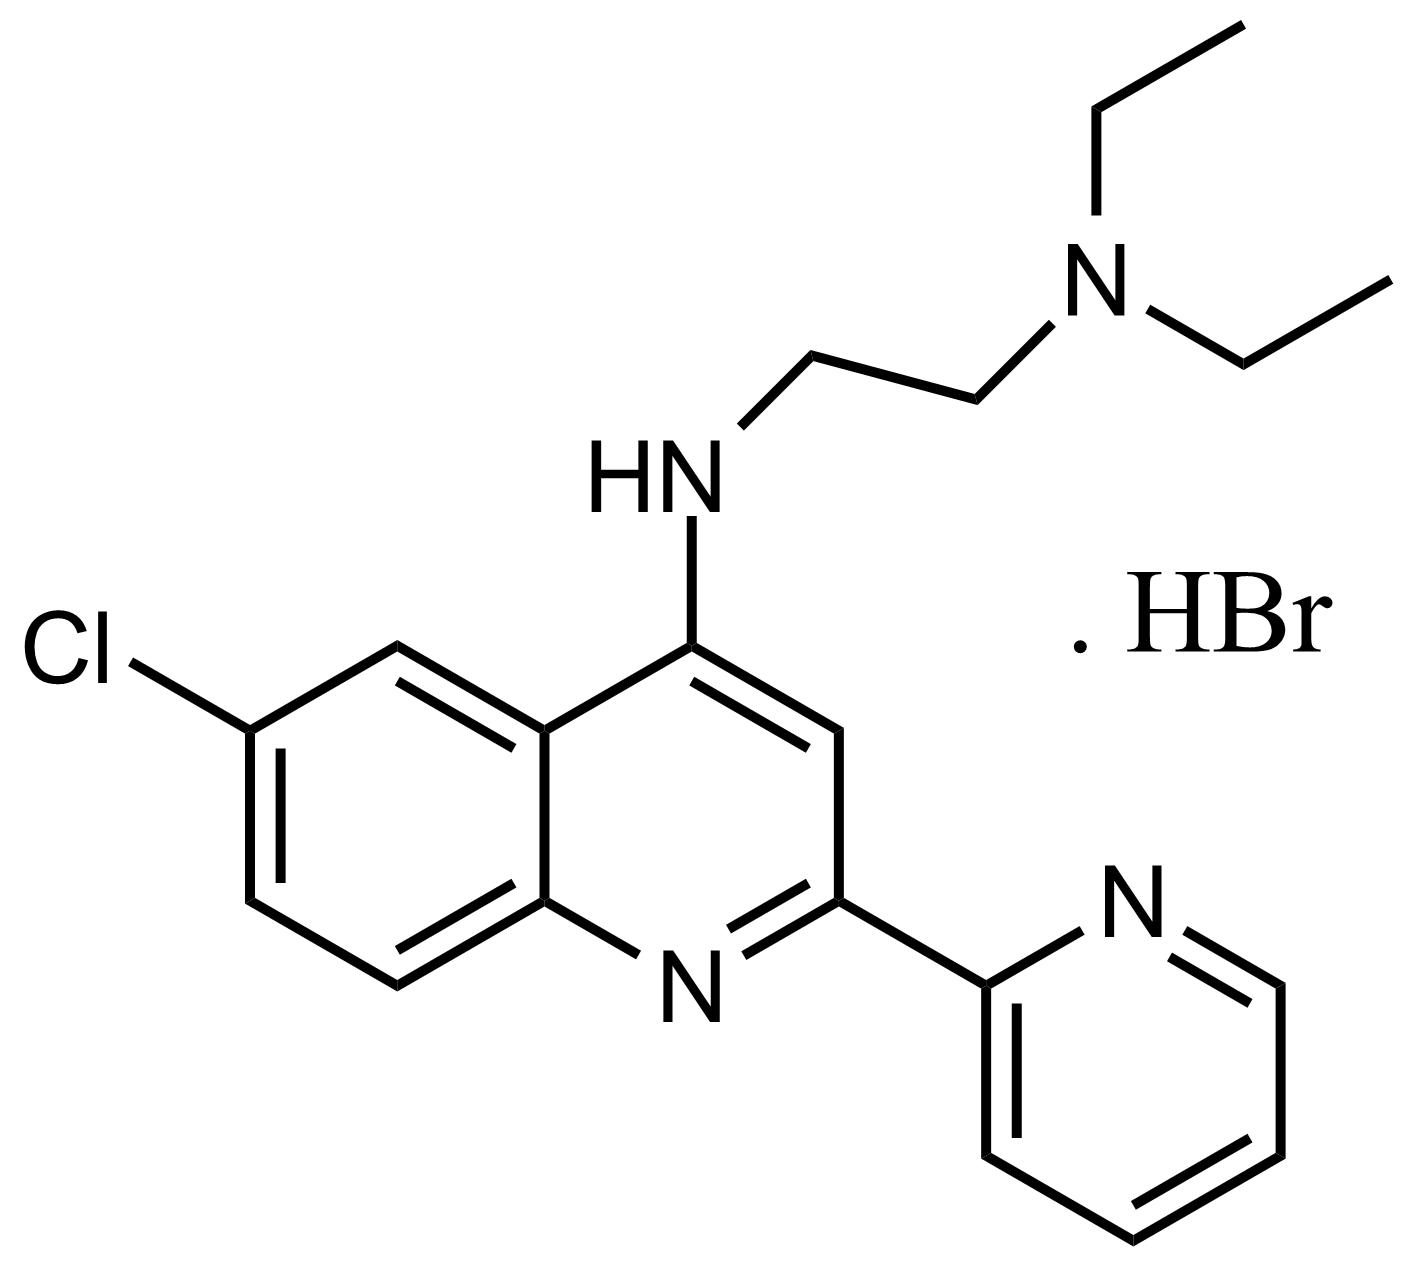 Structure of N'-(6-Chloro-2-(pyridin-2-yl)quinolin-4-yl)-N,N-diethylethane-1,2-diamine hydrobromide